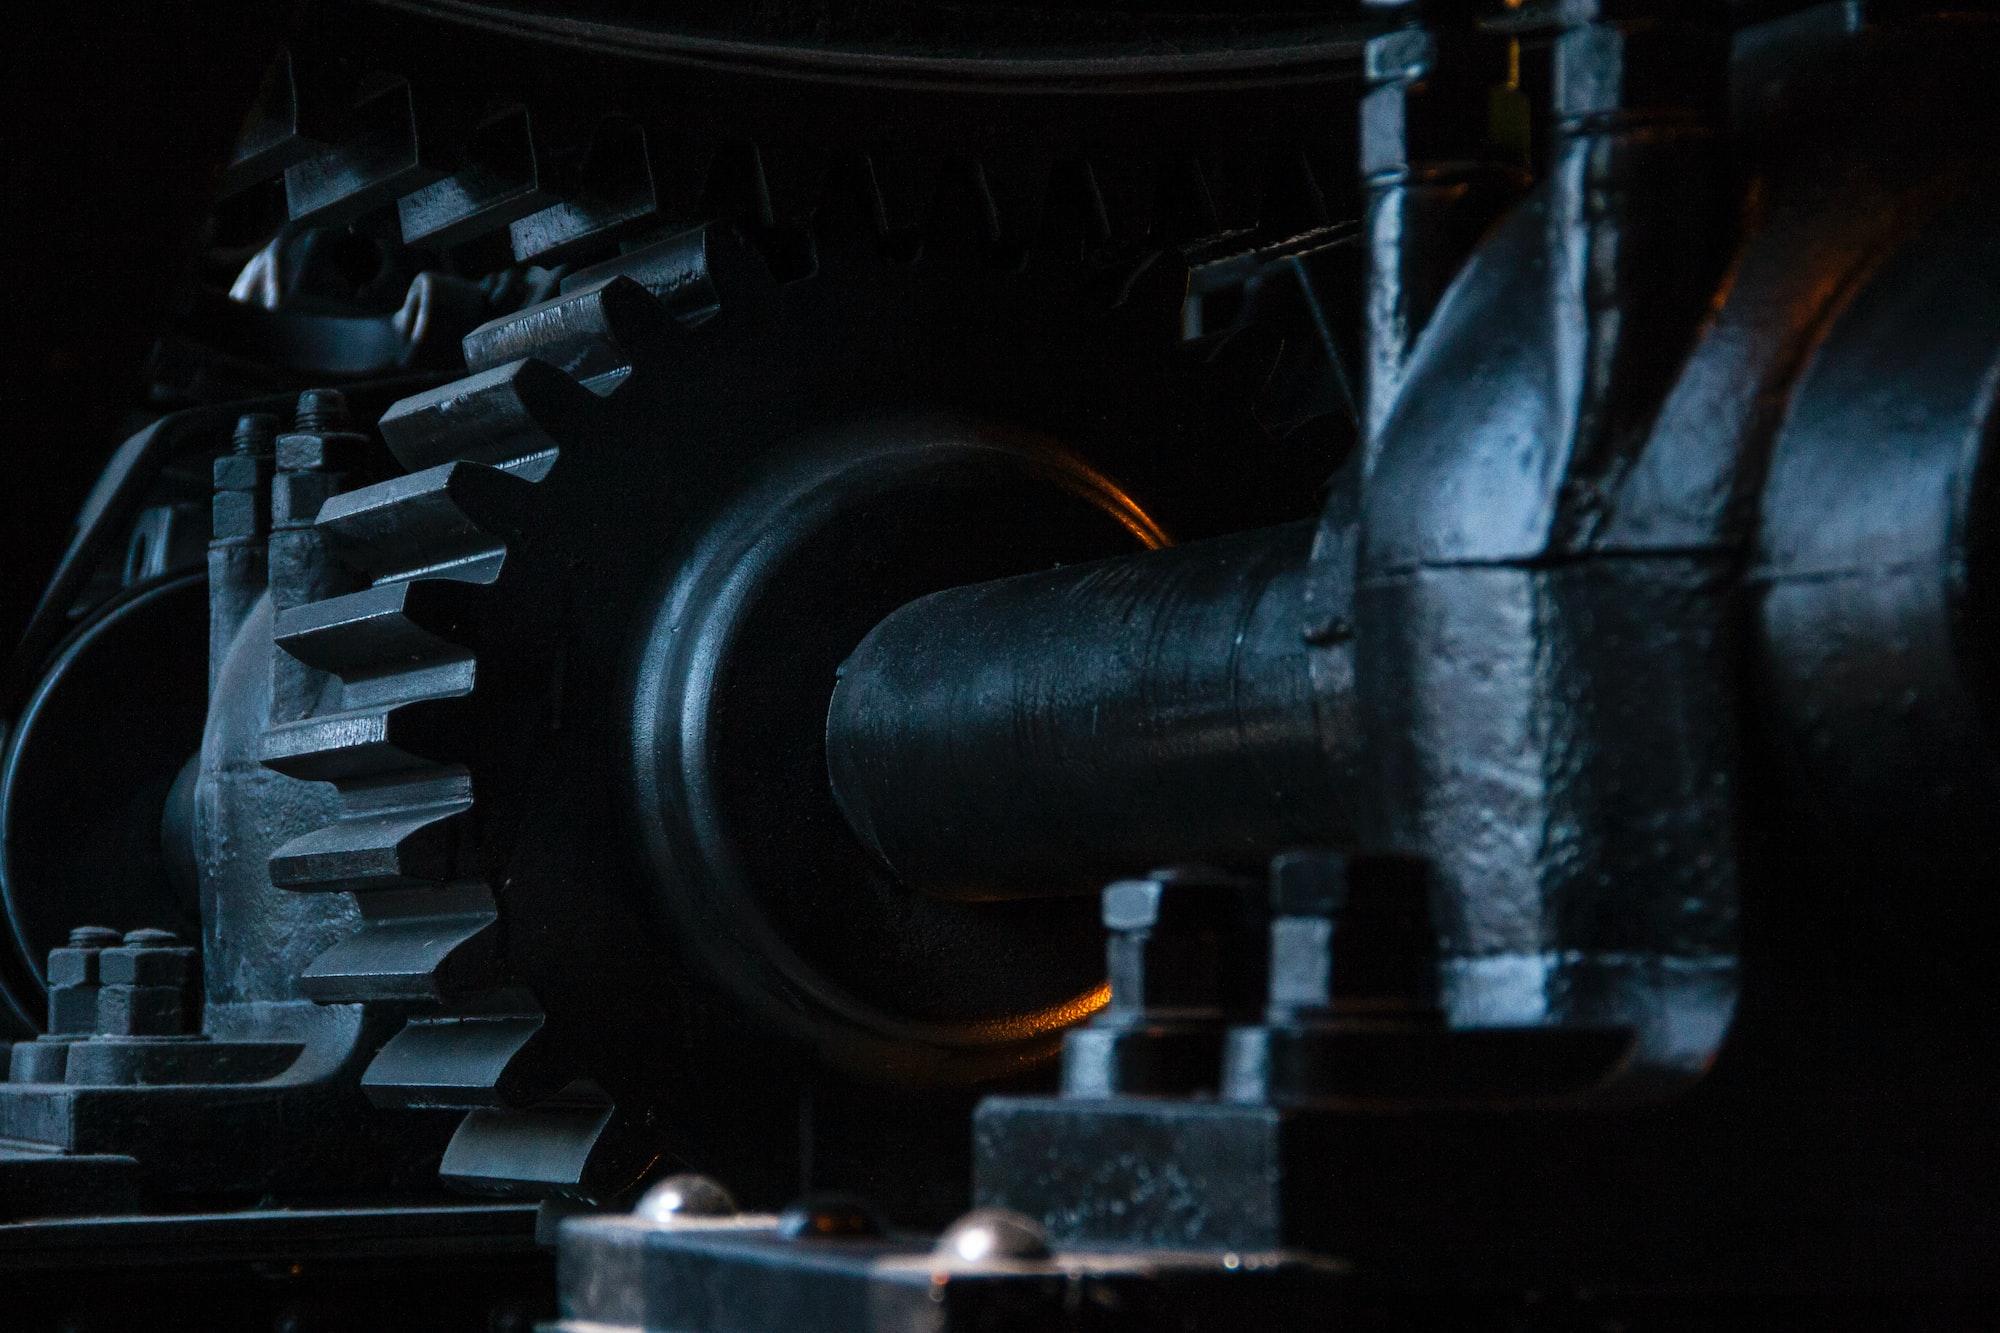 Tool vs Machine